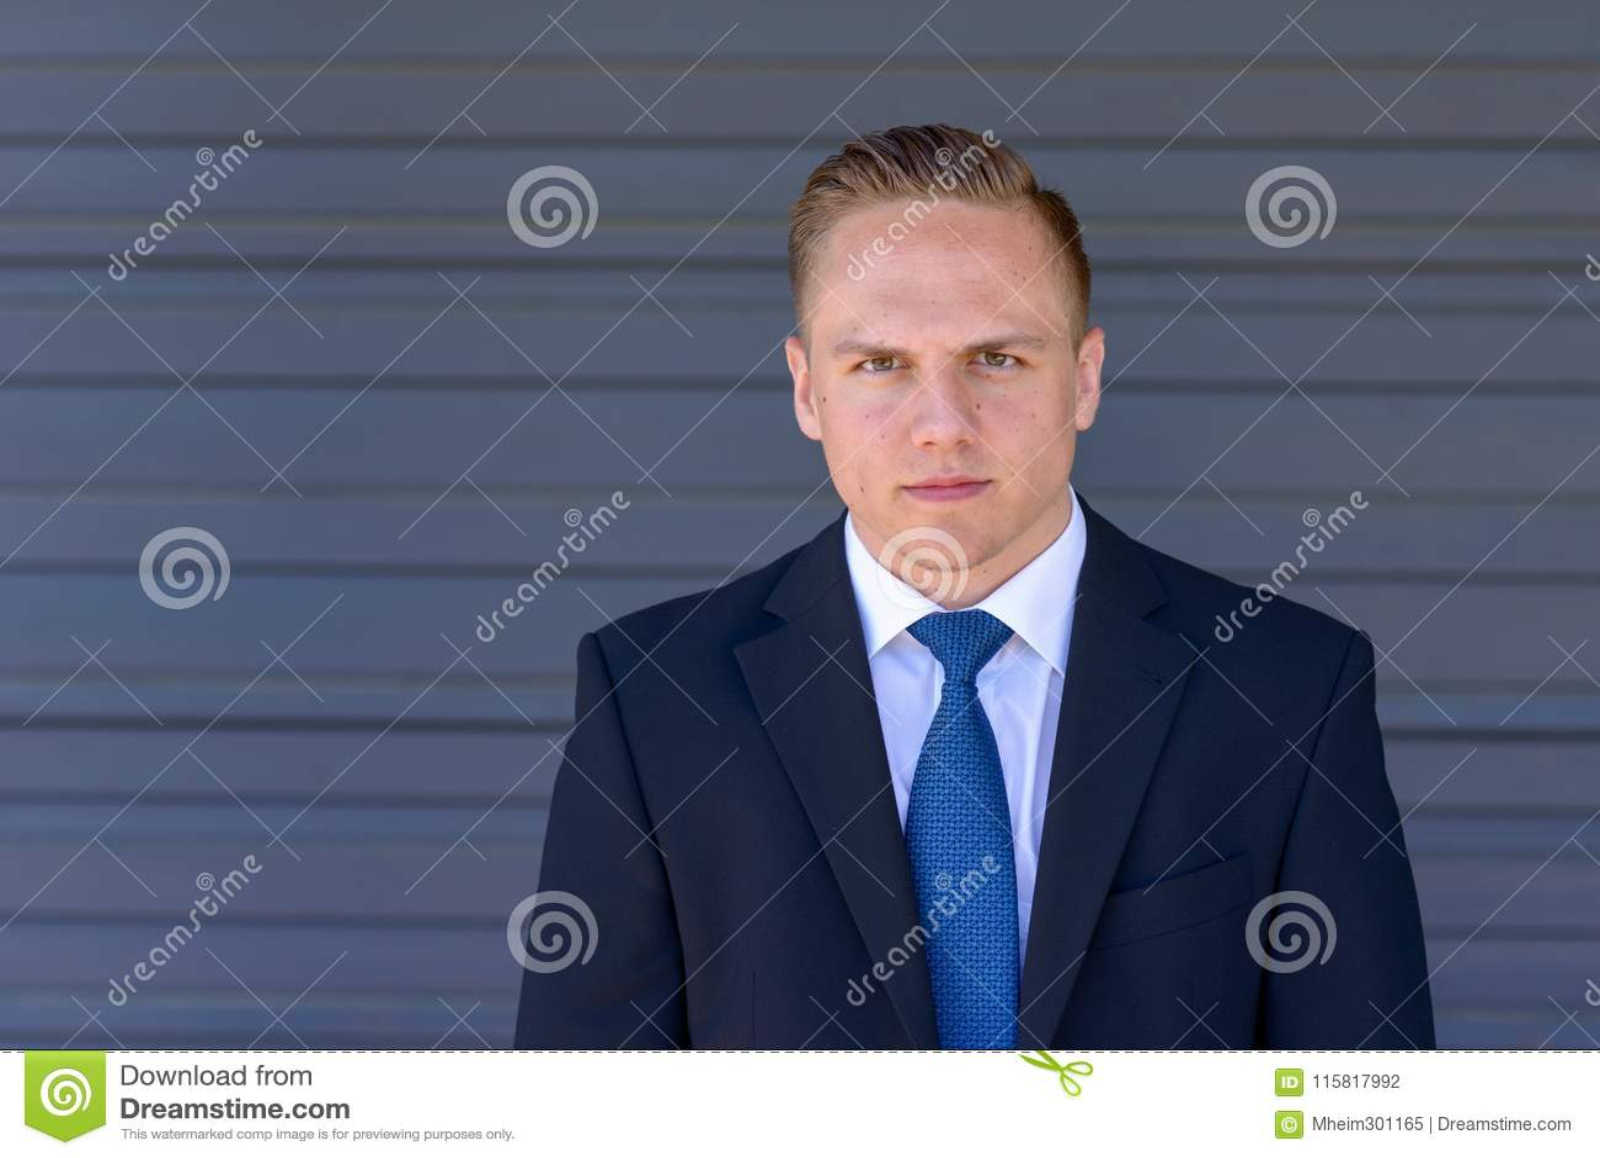 Intense Young Businessman Staring At Camera Stock Photo